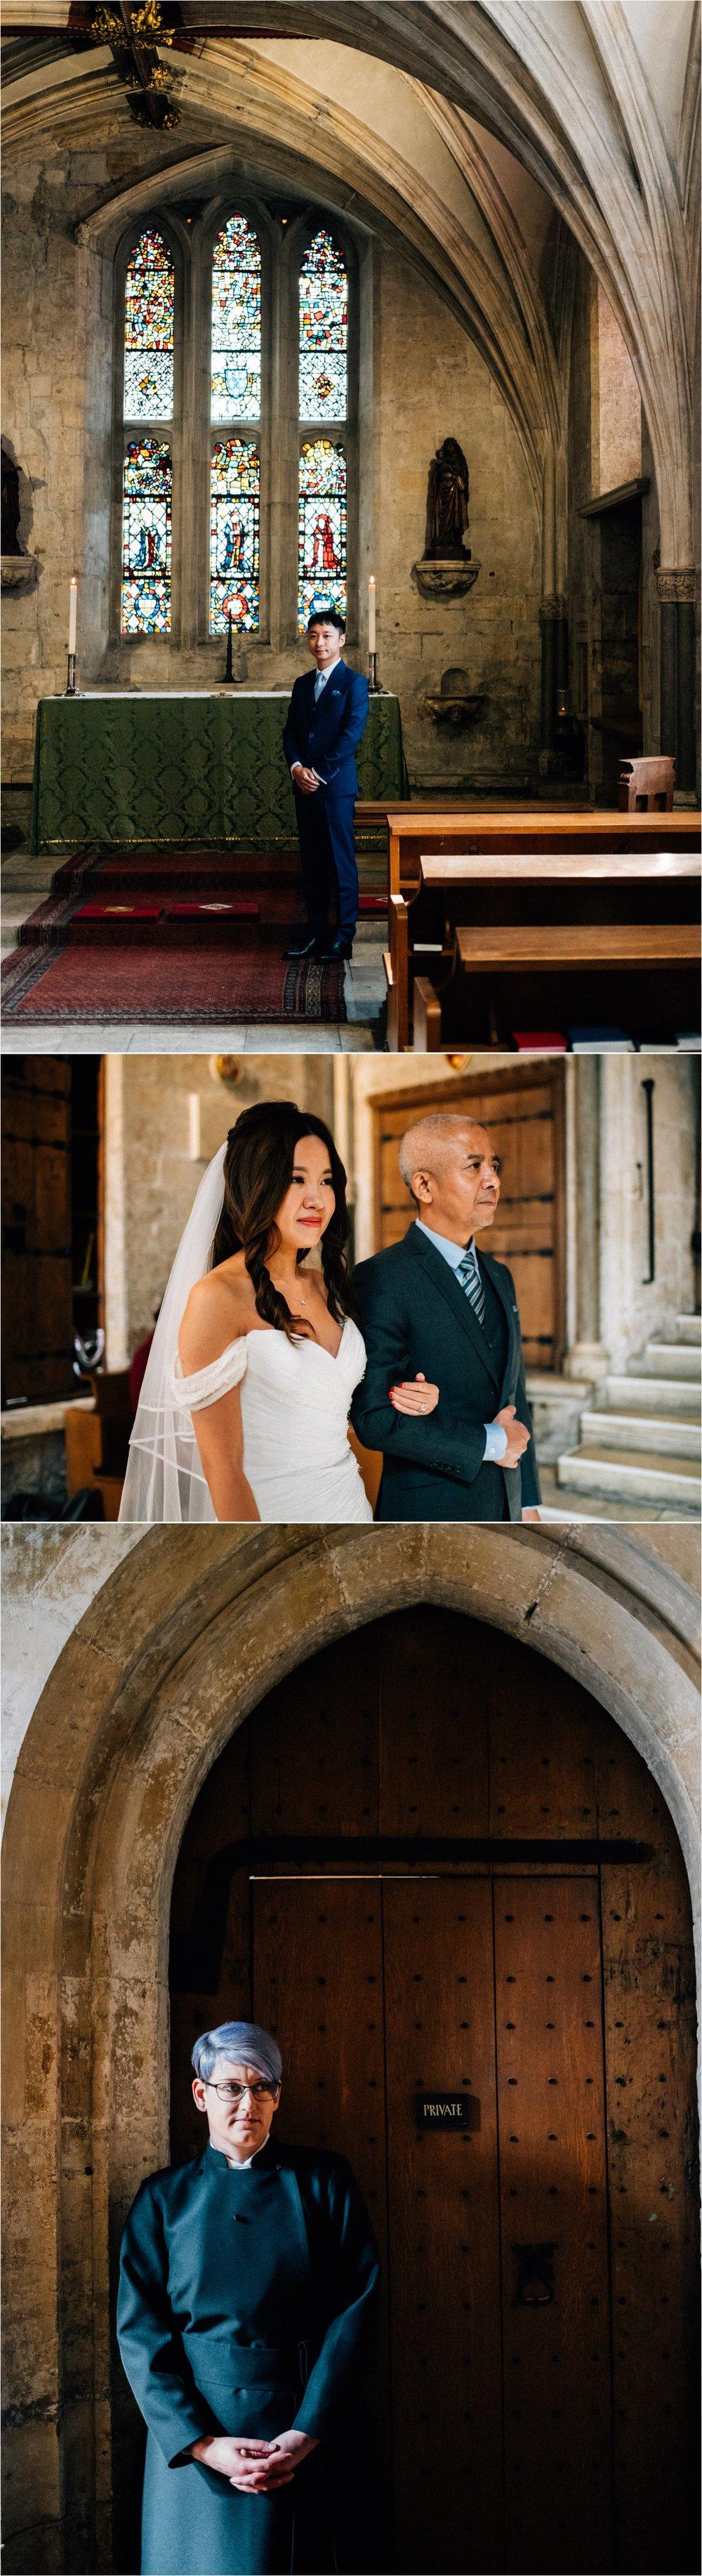 York city elopement wedding photographer_0127.jpg